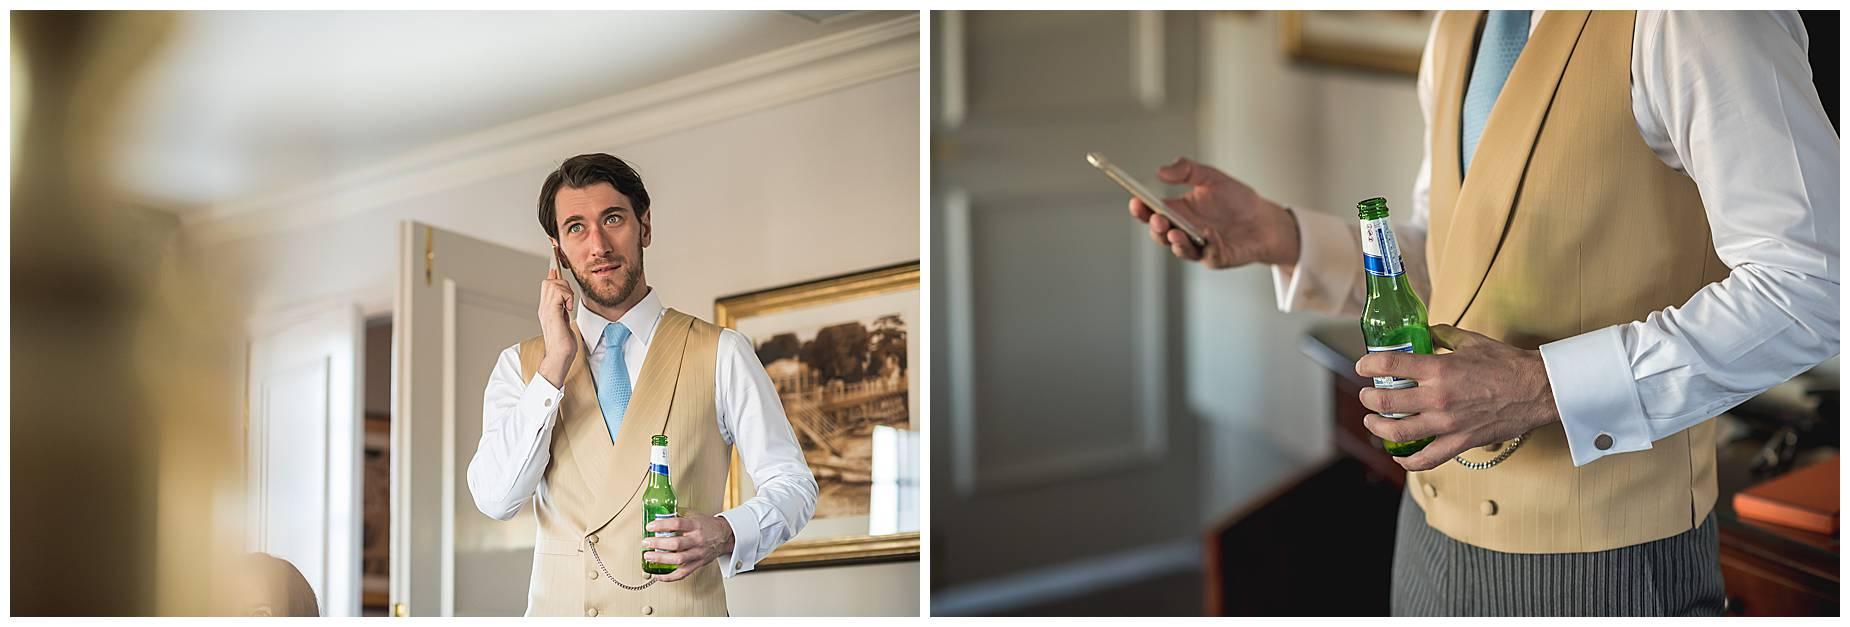 groom on the phone